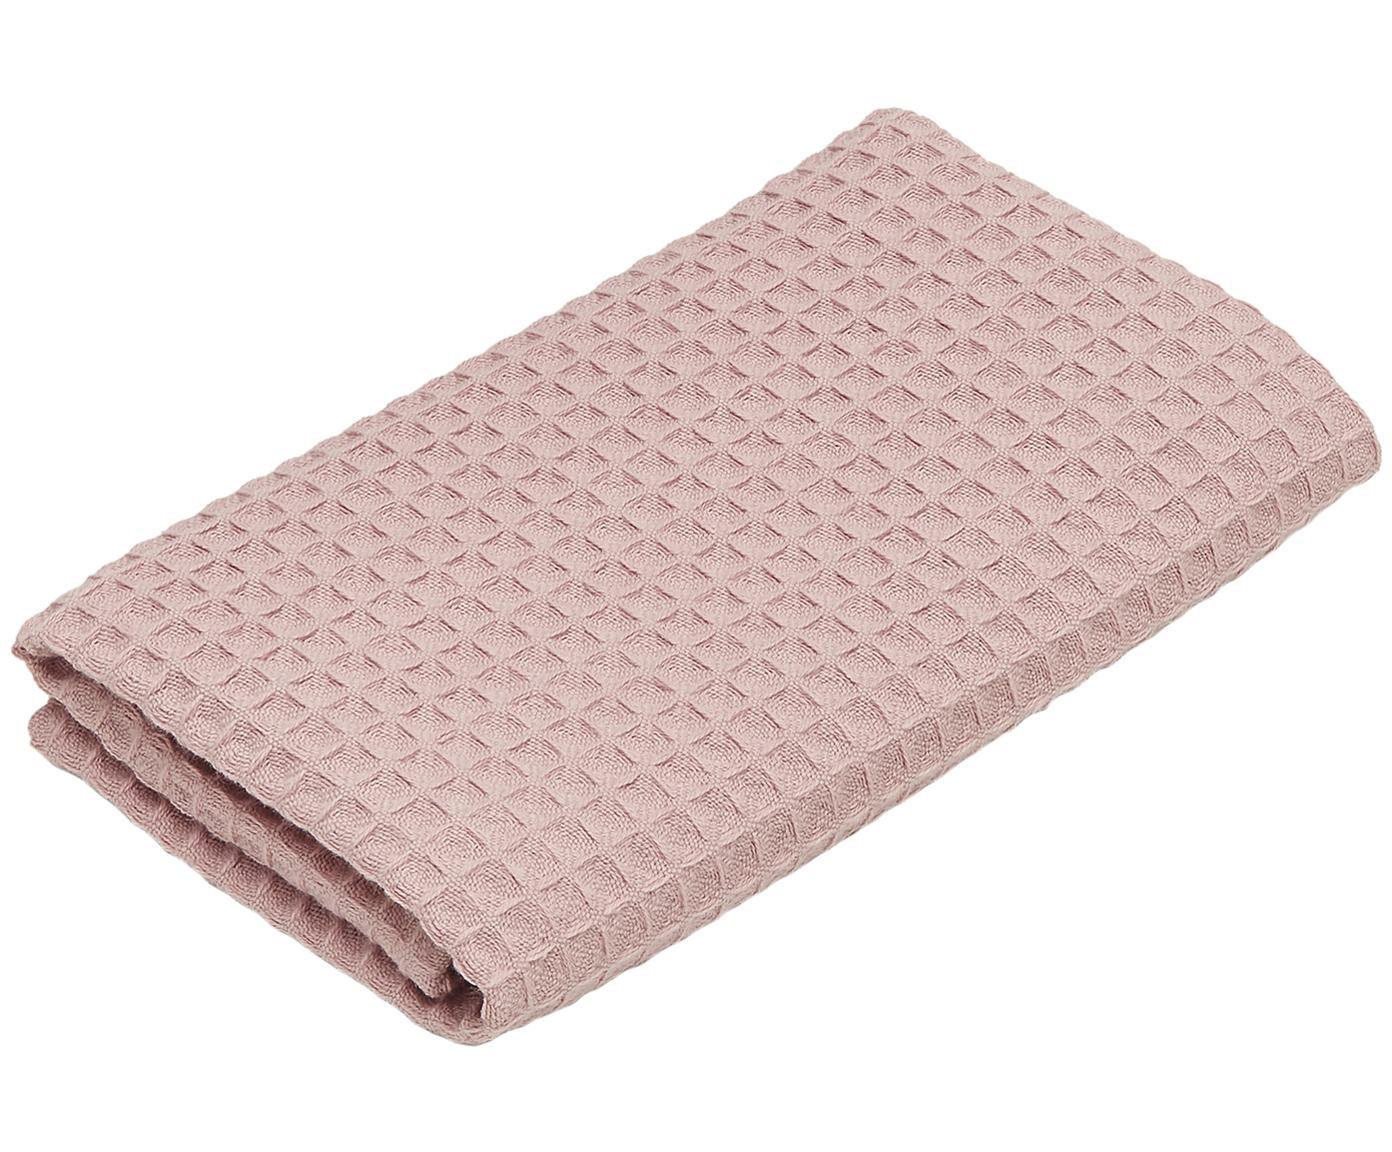 Wafelpiqué handdoek Karima, 100% katoen lichte kwaliteit, 250 g/m², Oudroze, Gastendoekje